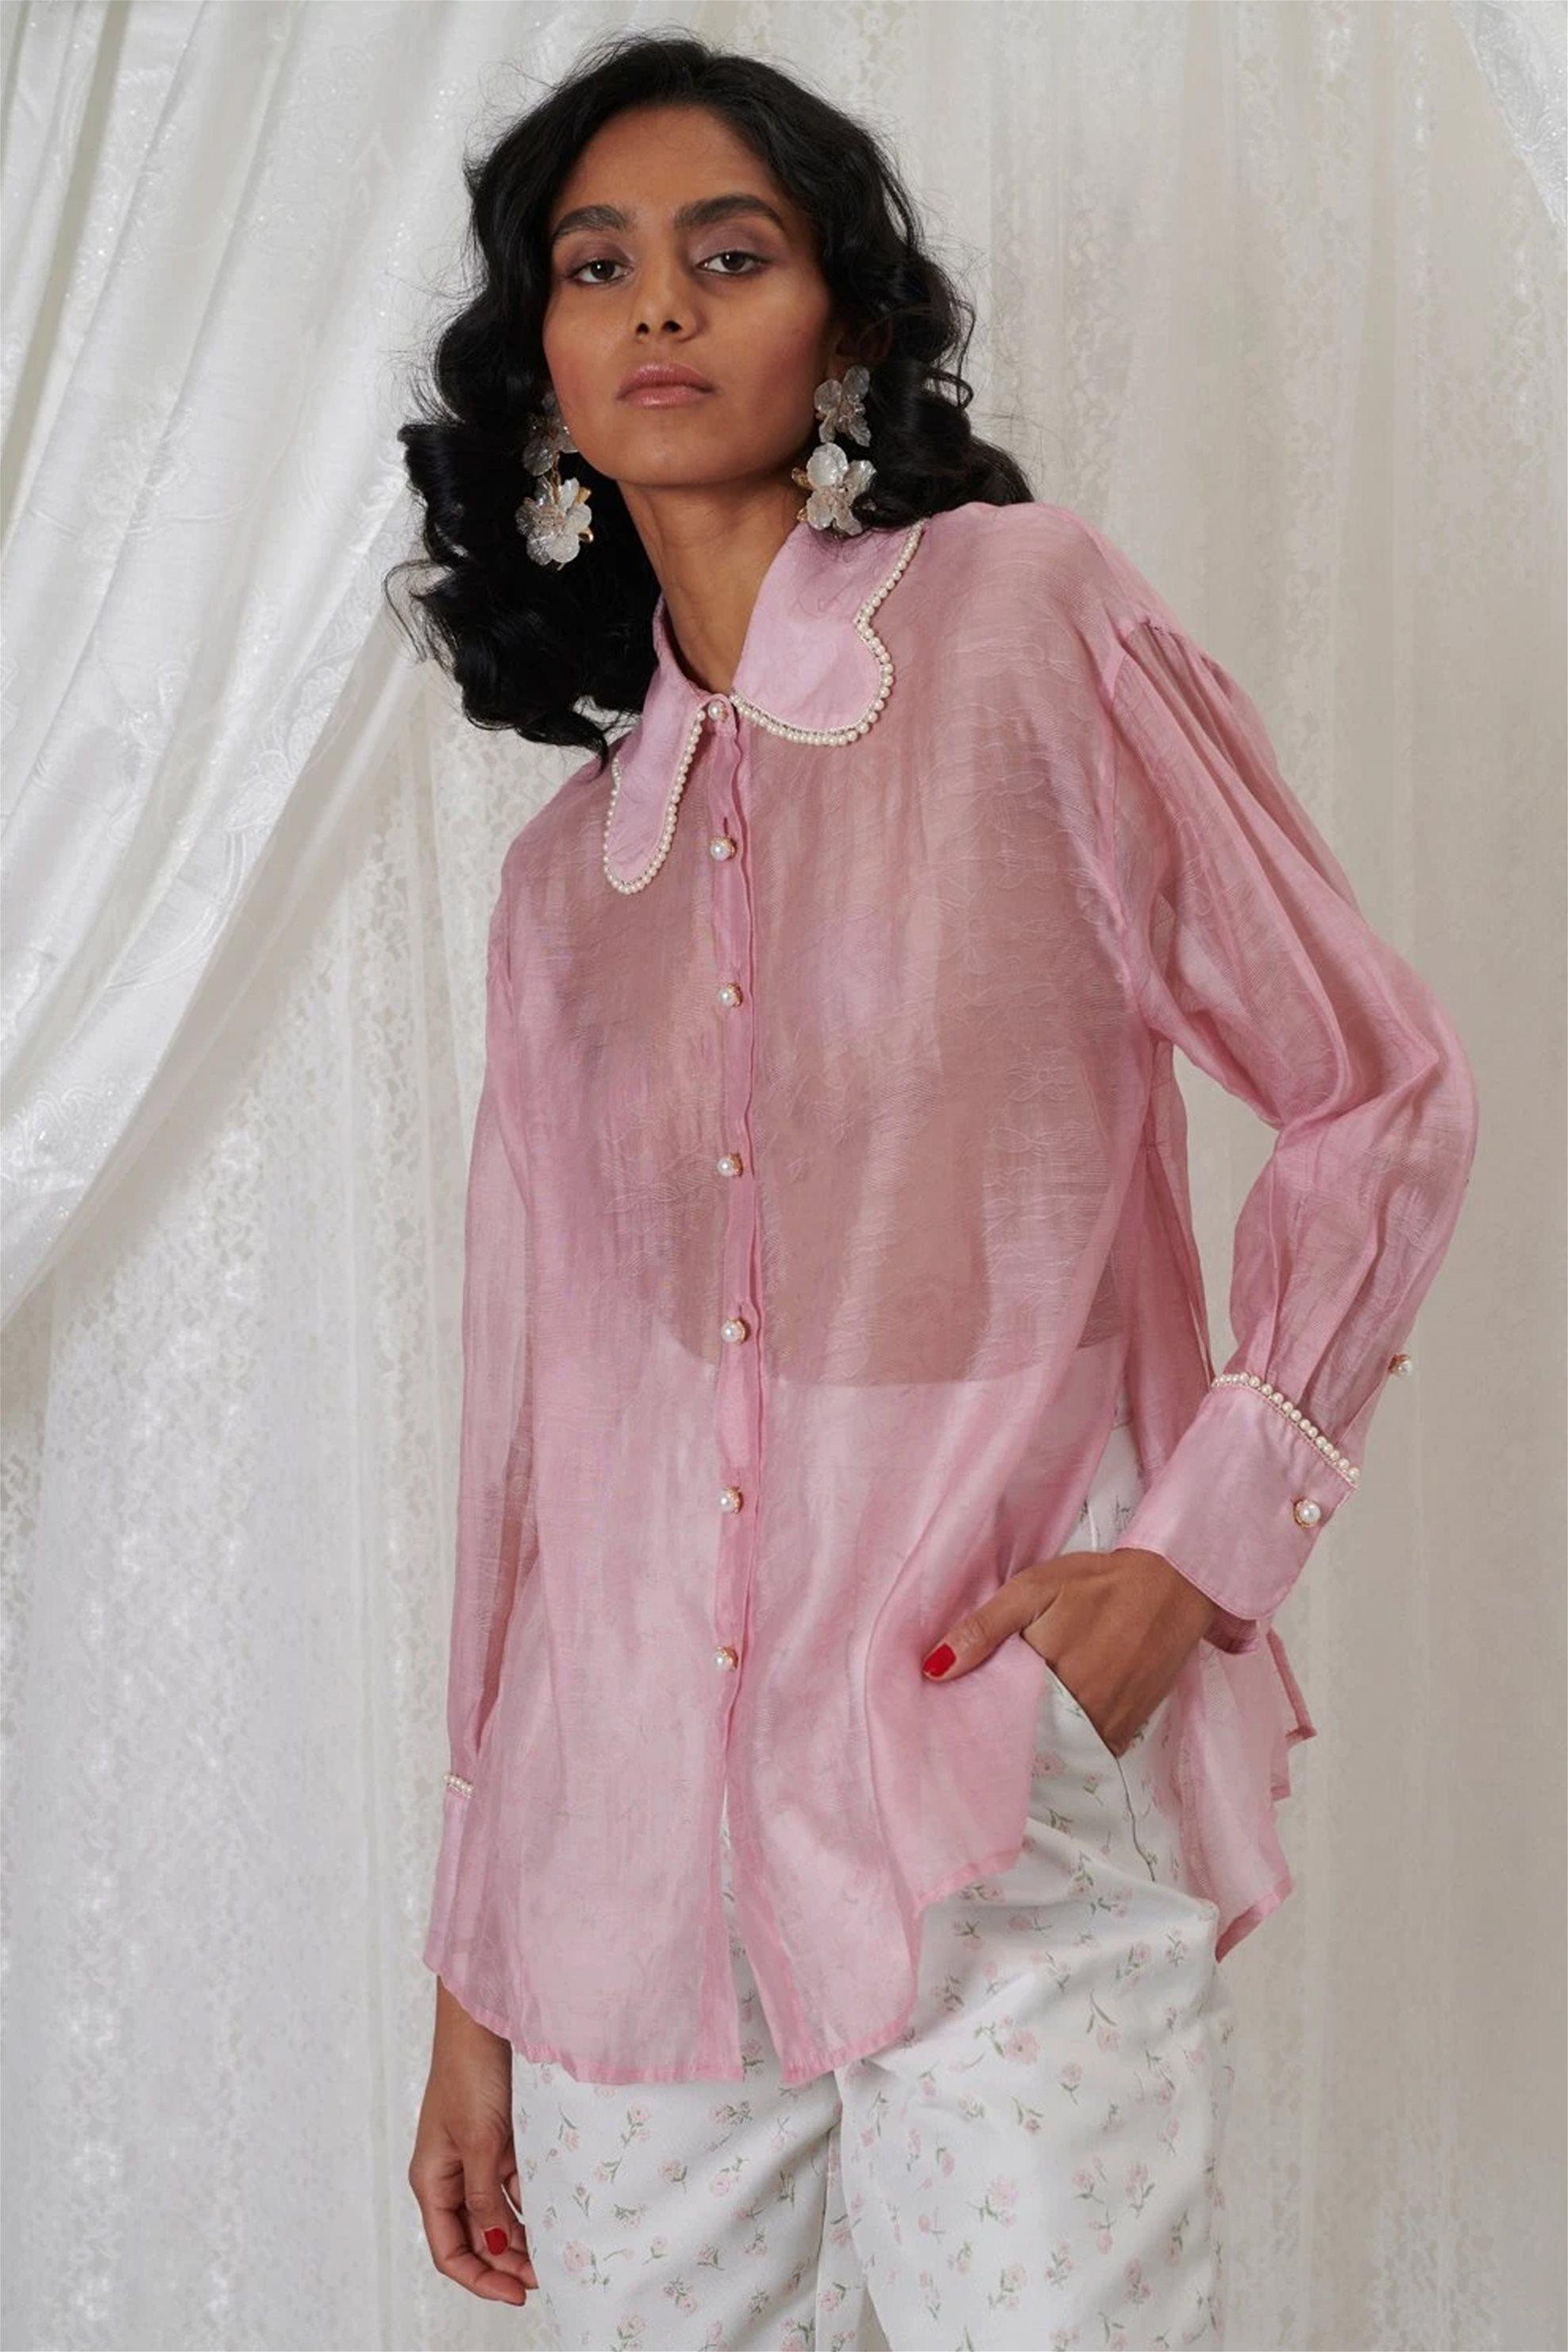 Sister Jane γυναικείο πουκάμισο με ανάγλυφο σχέδιο και πέρλες